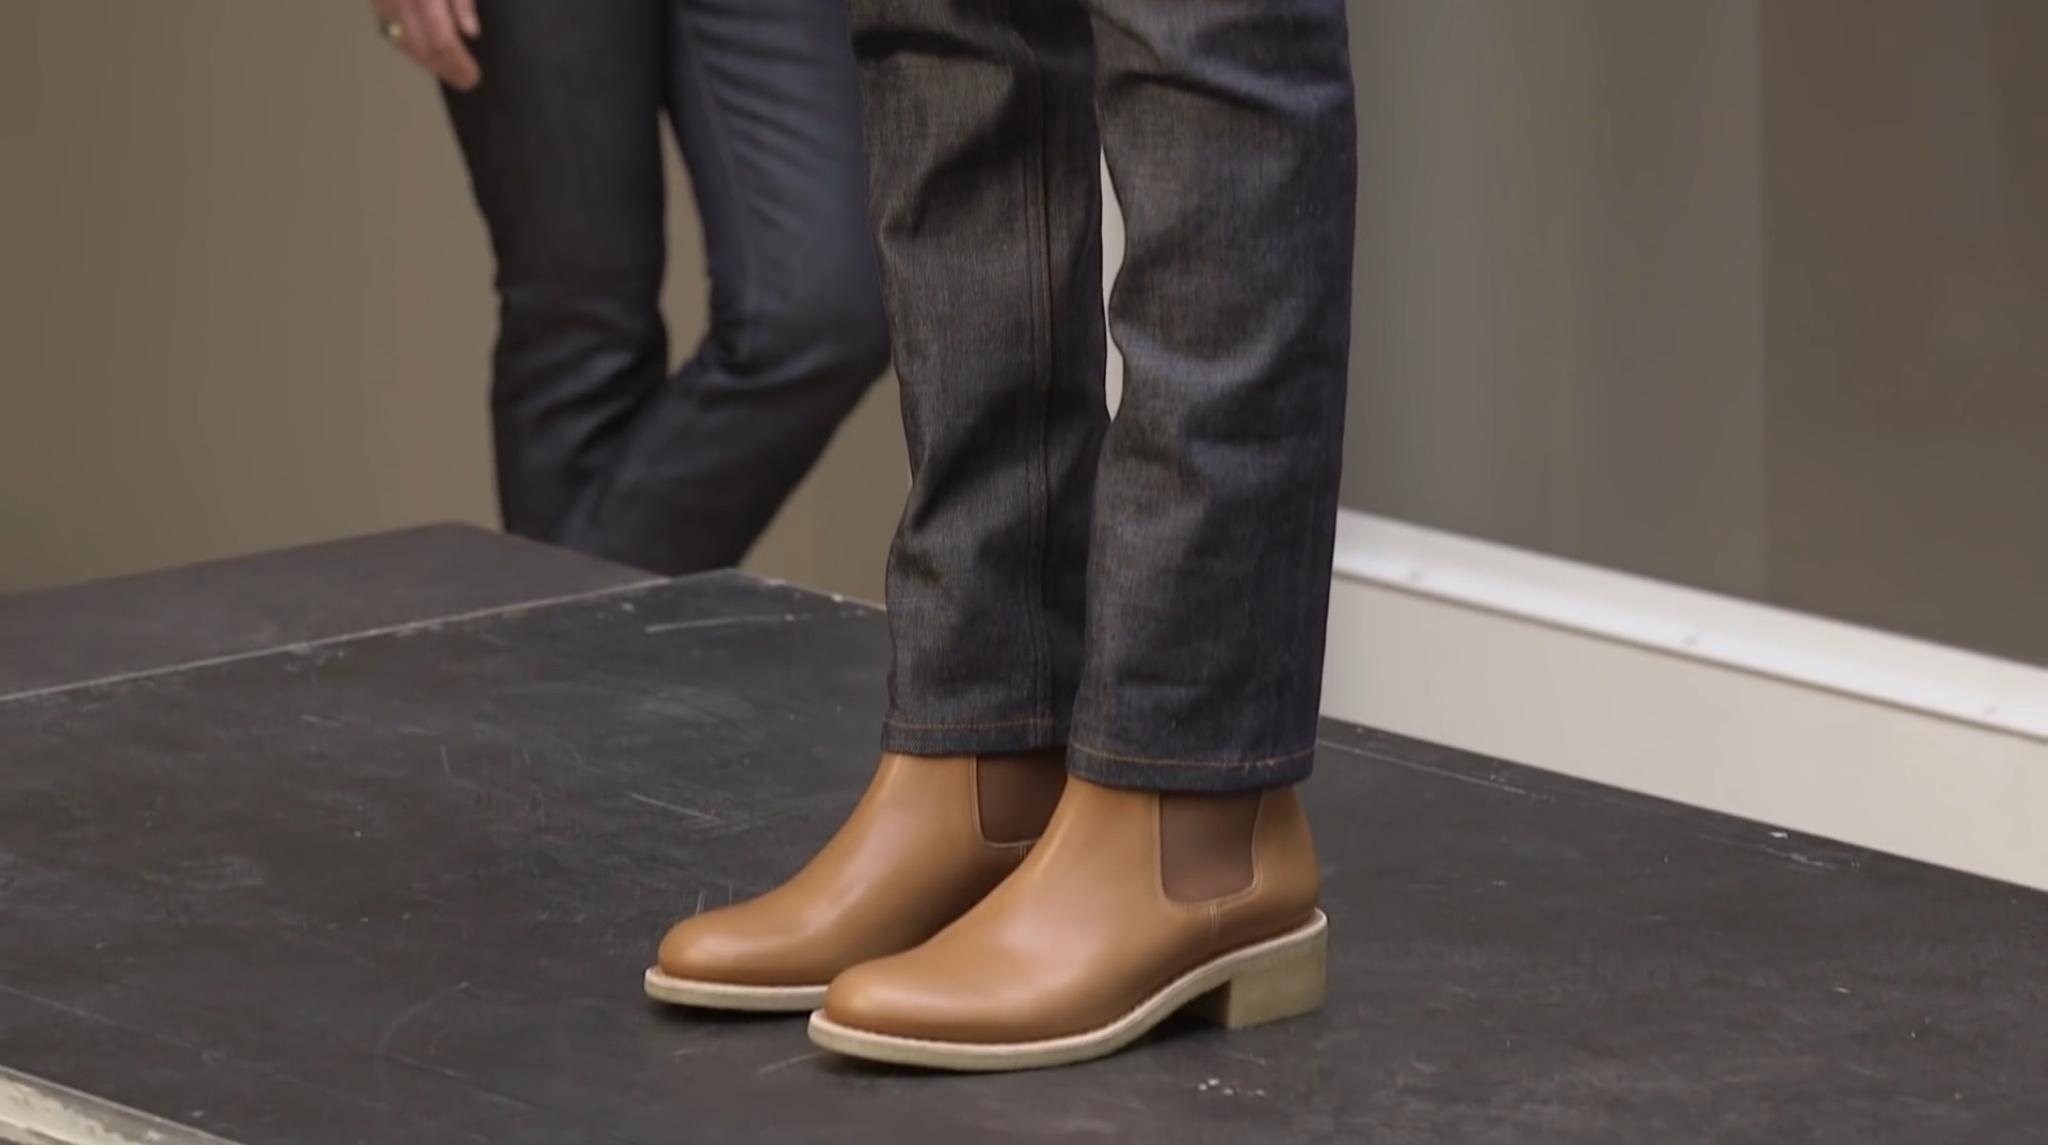 Boots tannage végétal